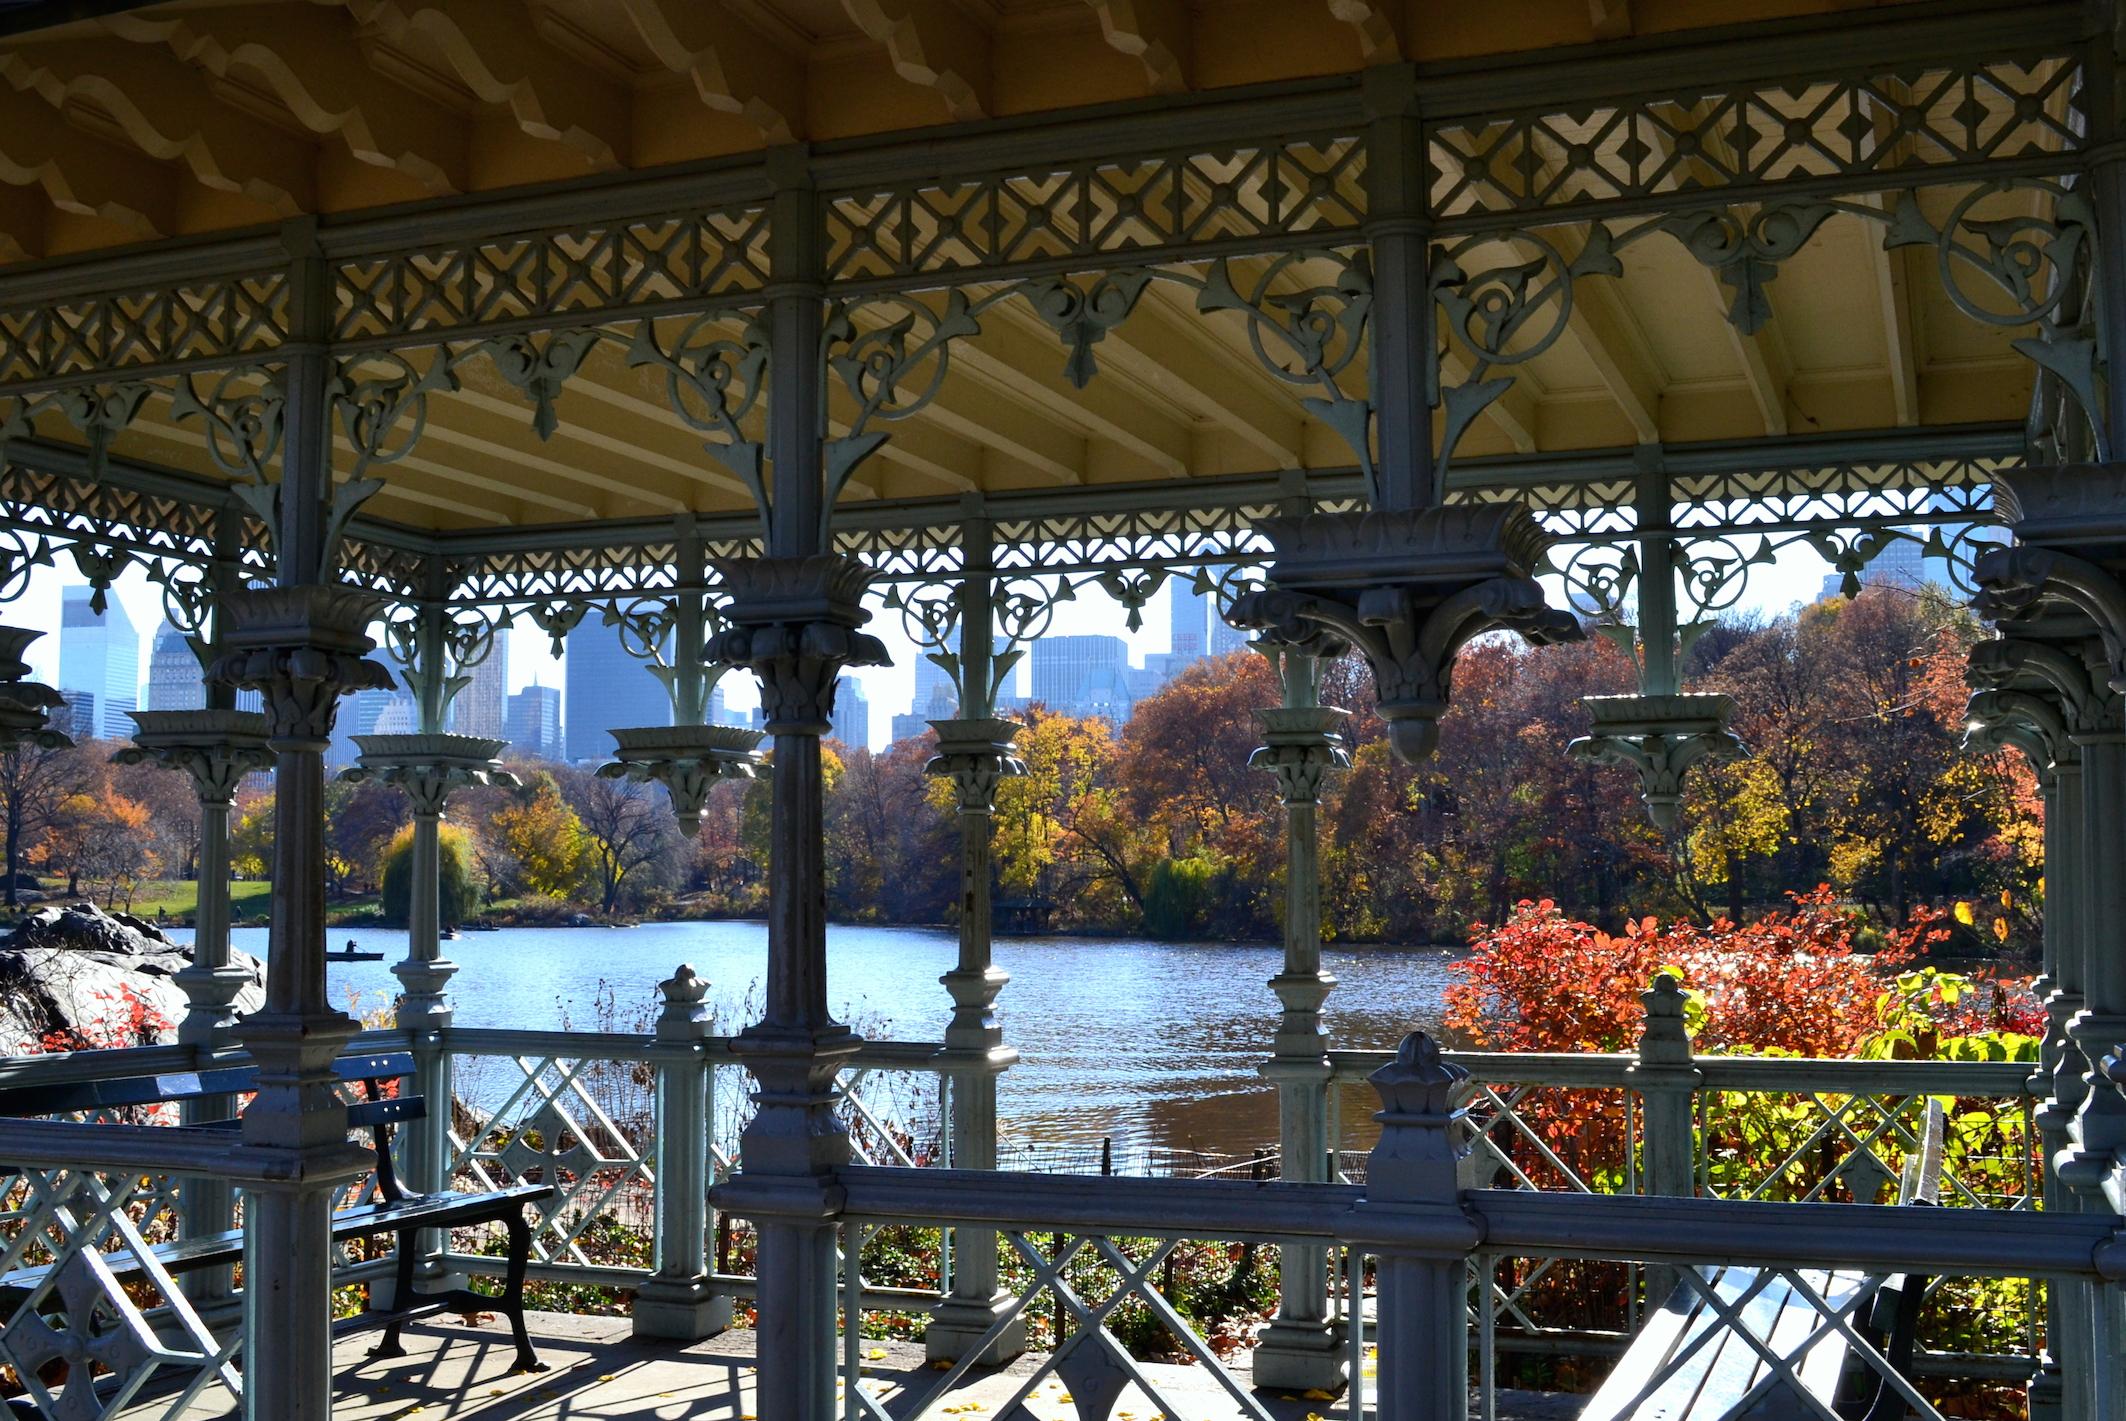 Central Park Lake NYC Foliage photos